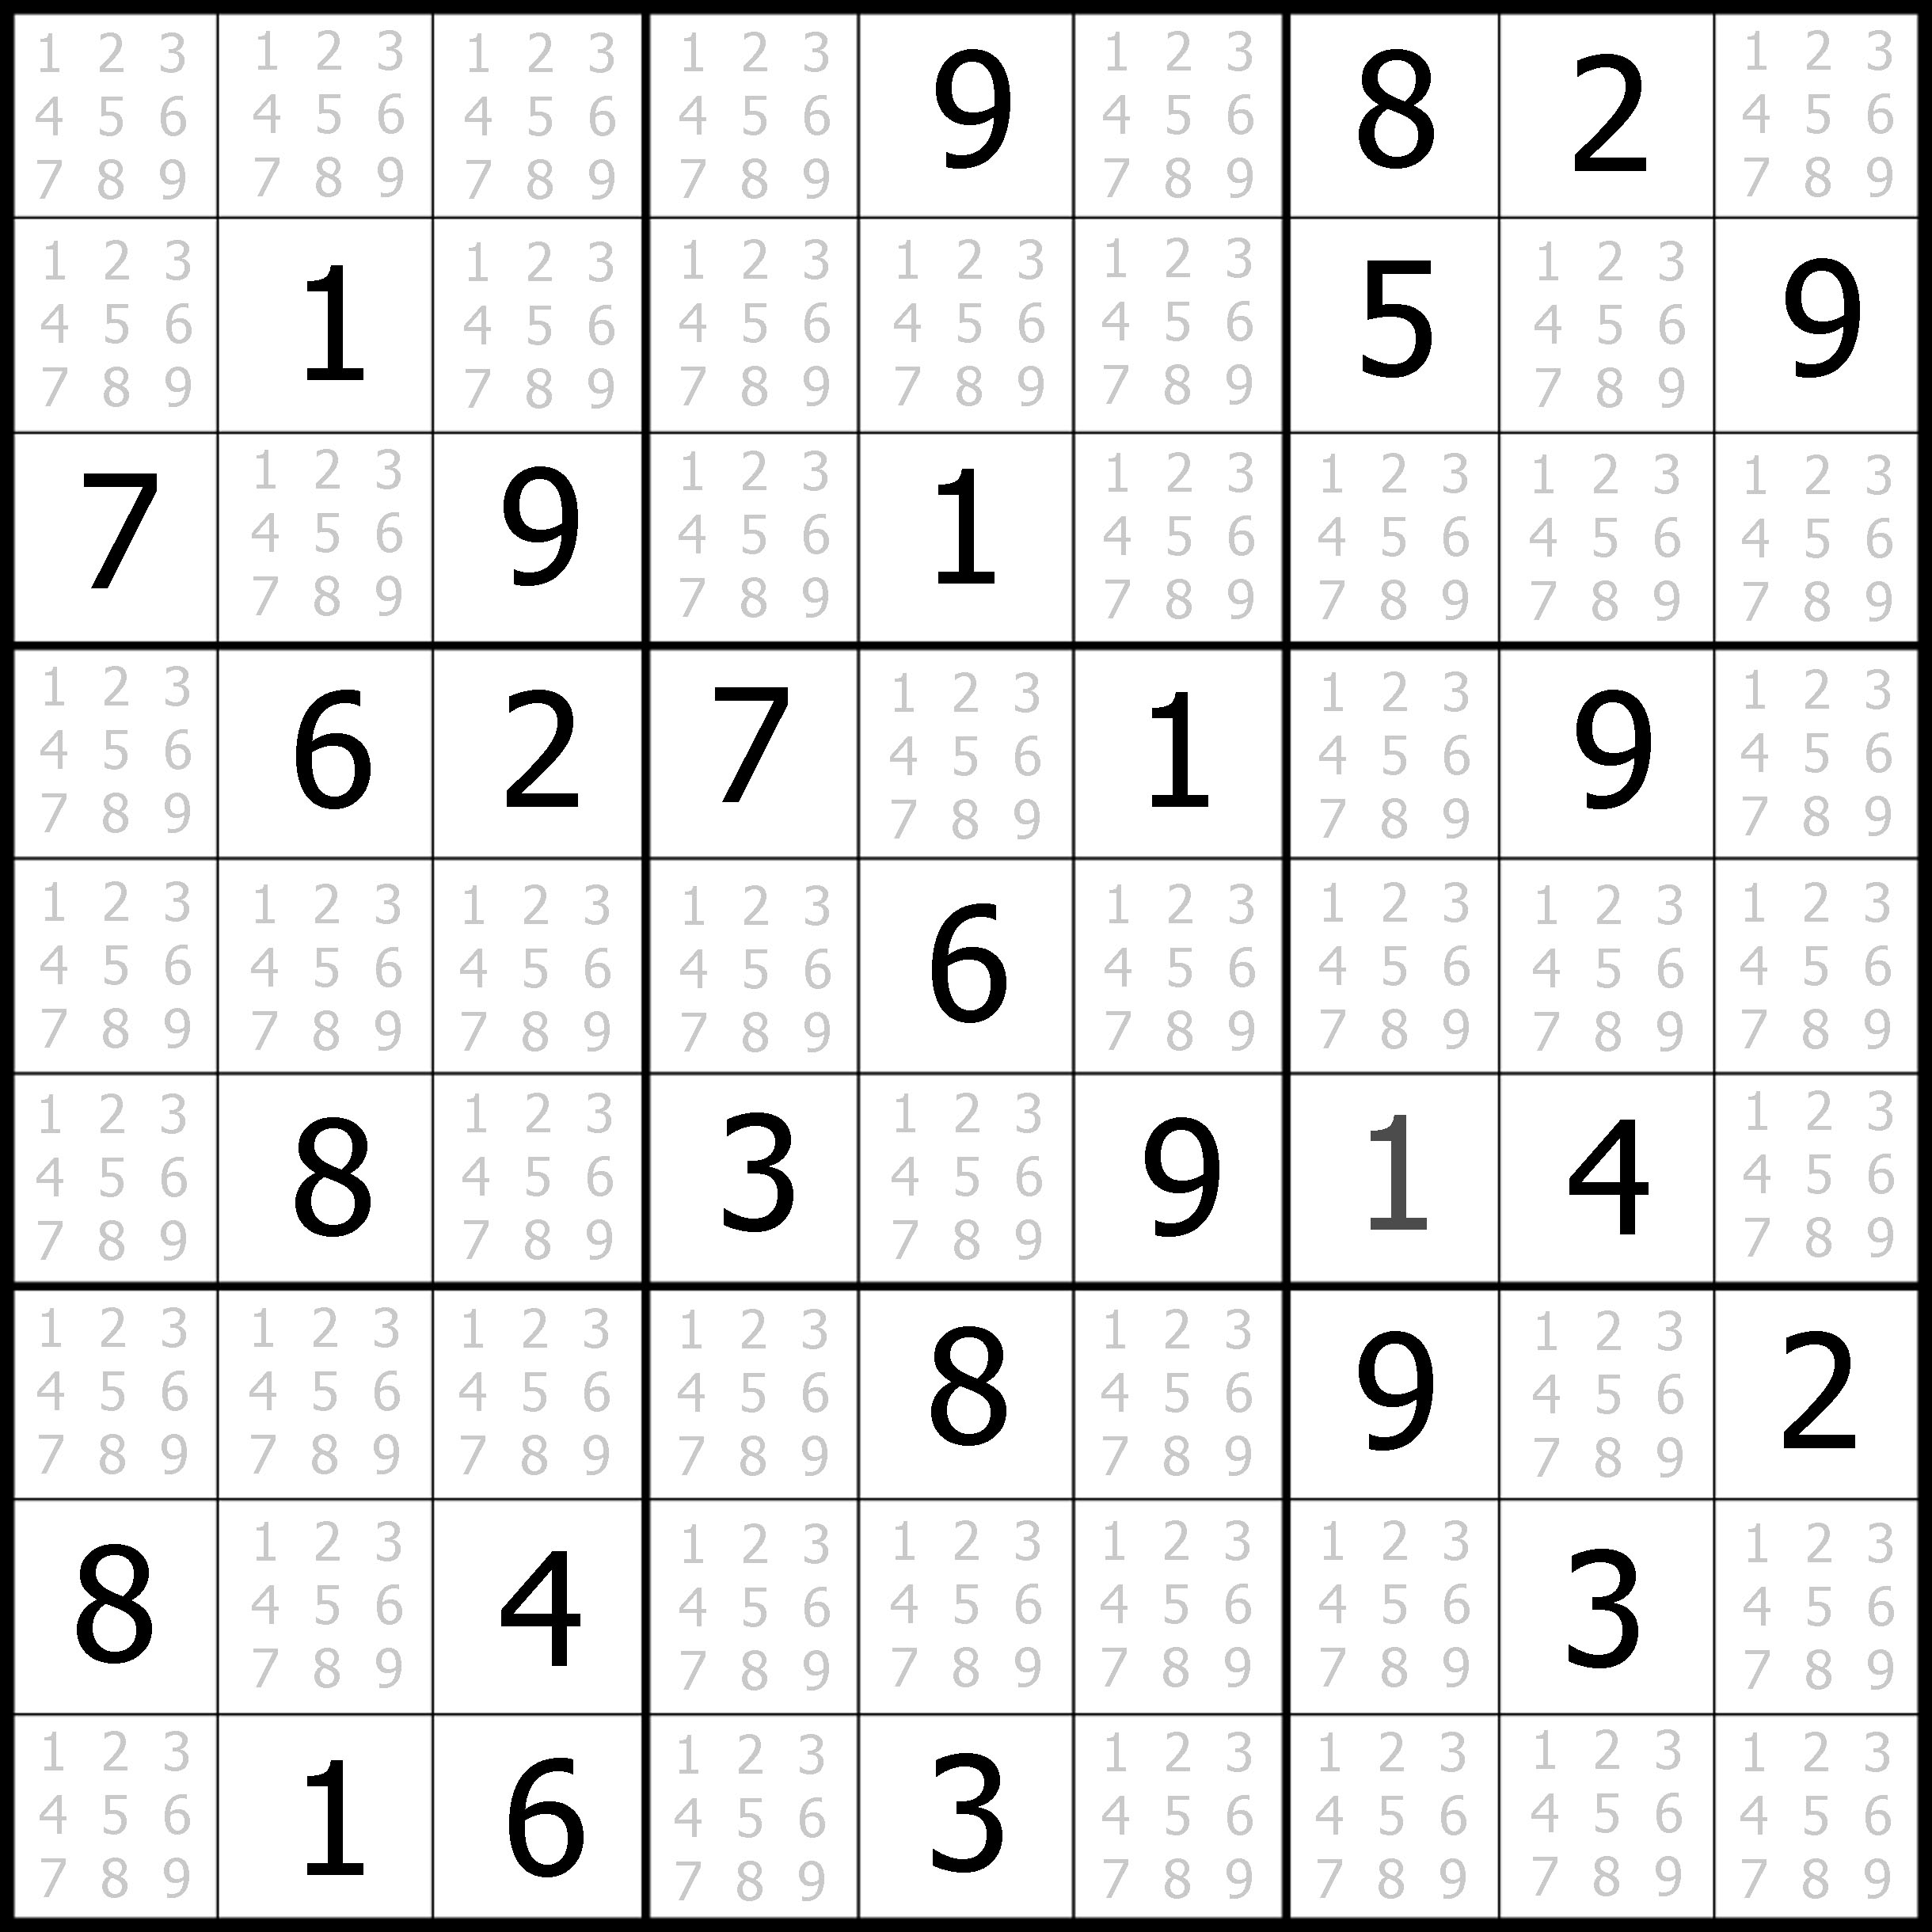 Sudoku Puzzler | Free, Printable, Updated Sudoku Puzzles With A - Printable Sudoku Puzzles For Beginners